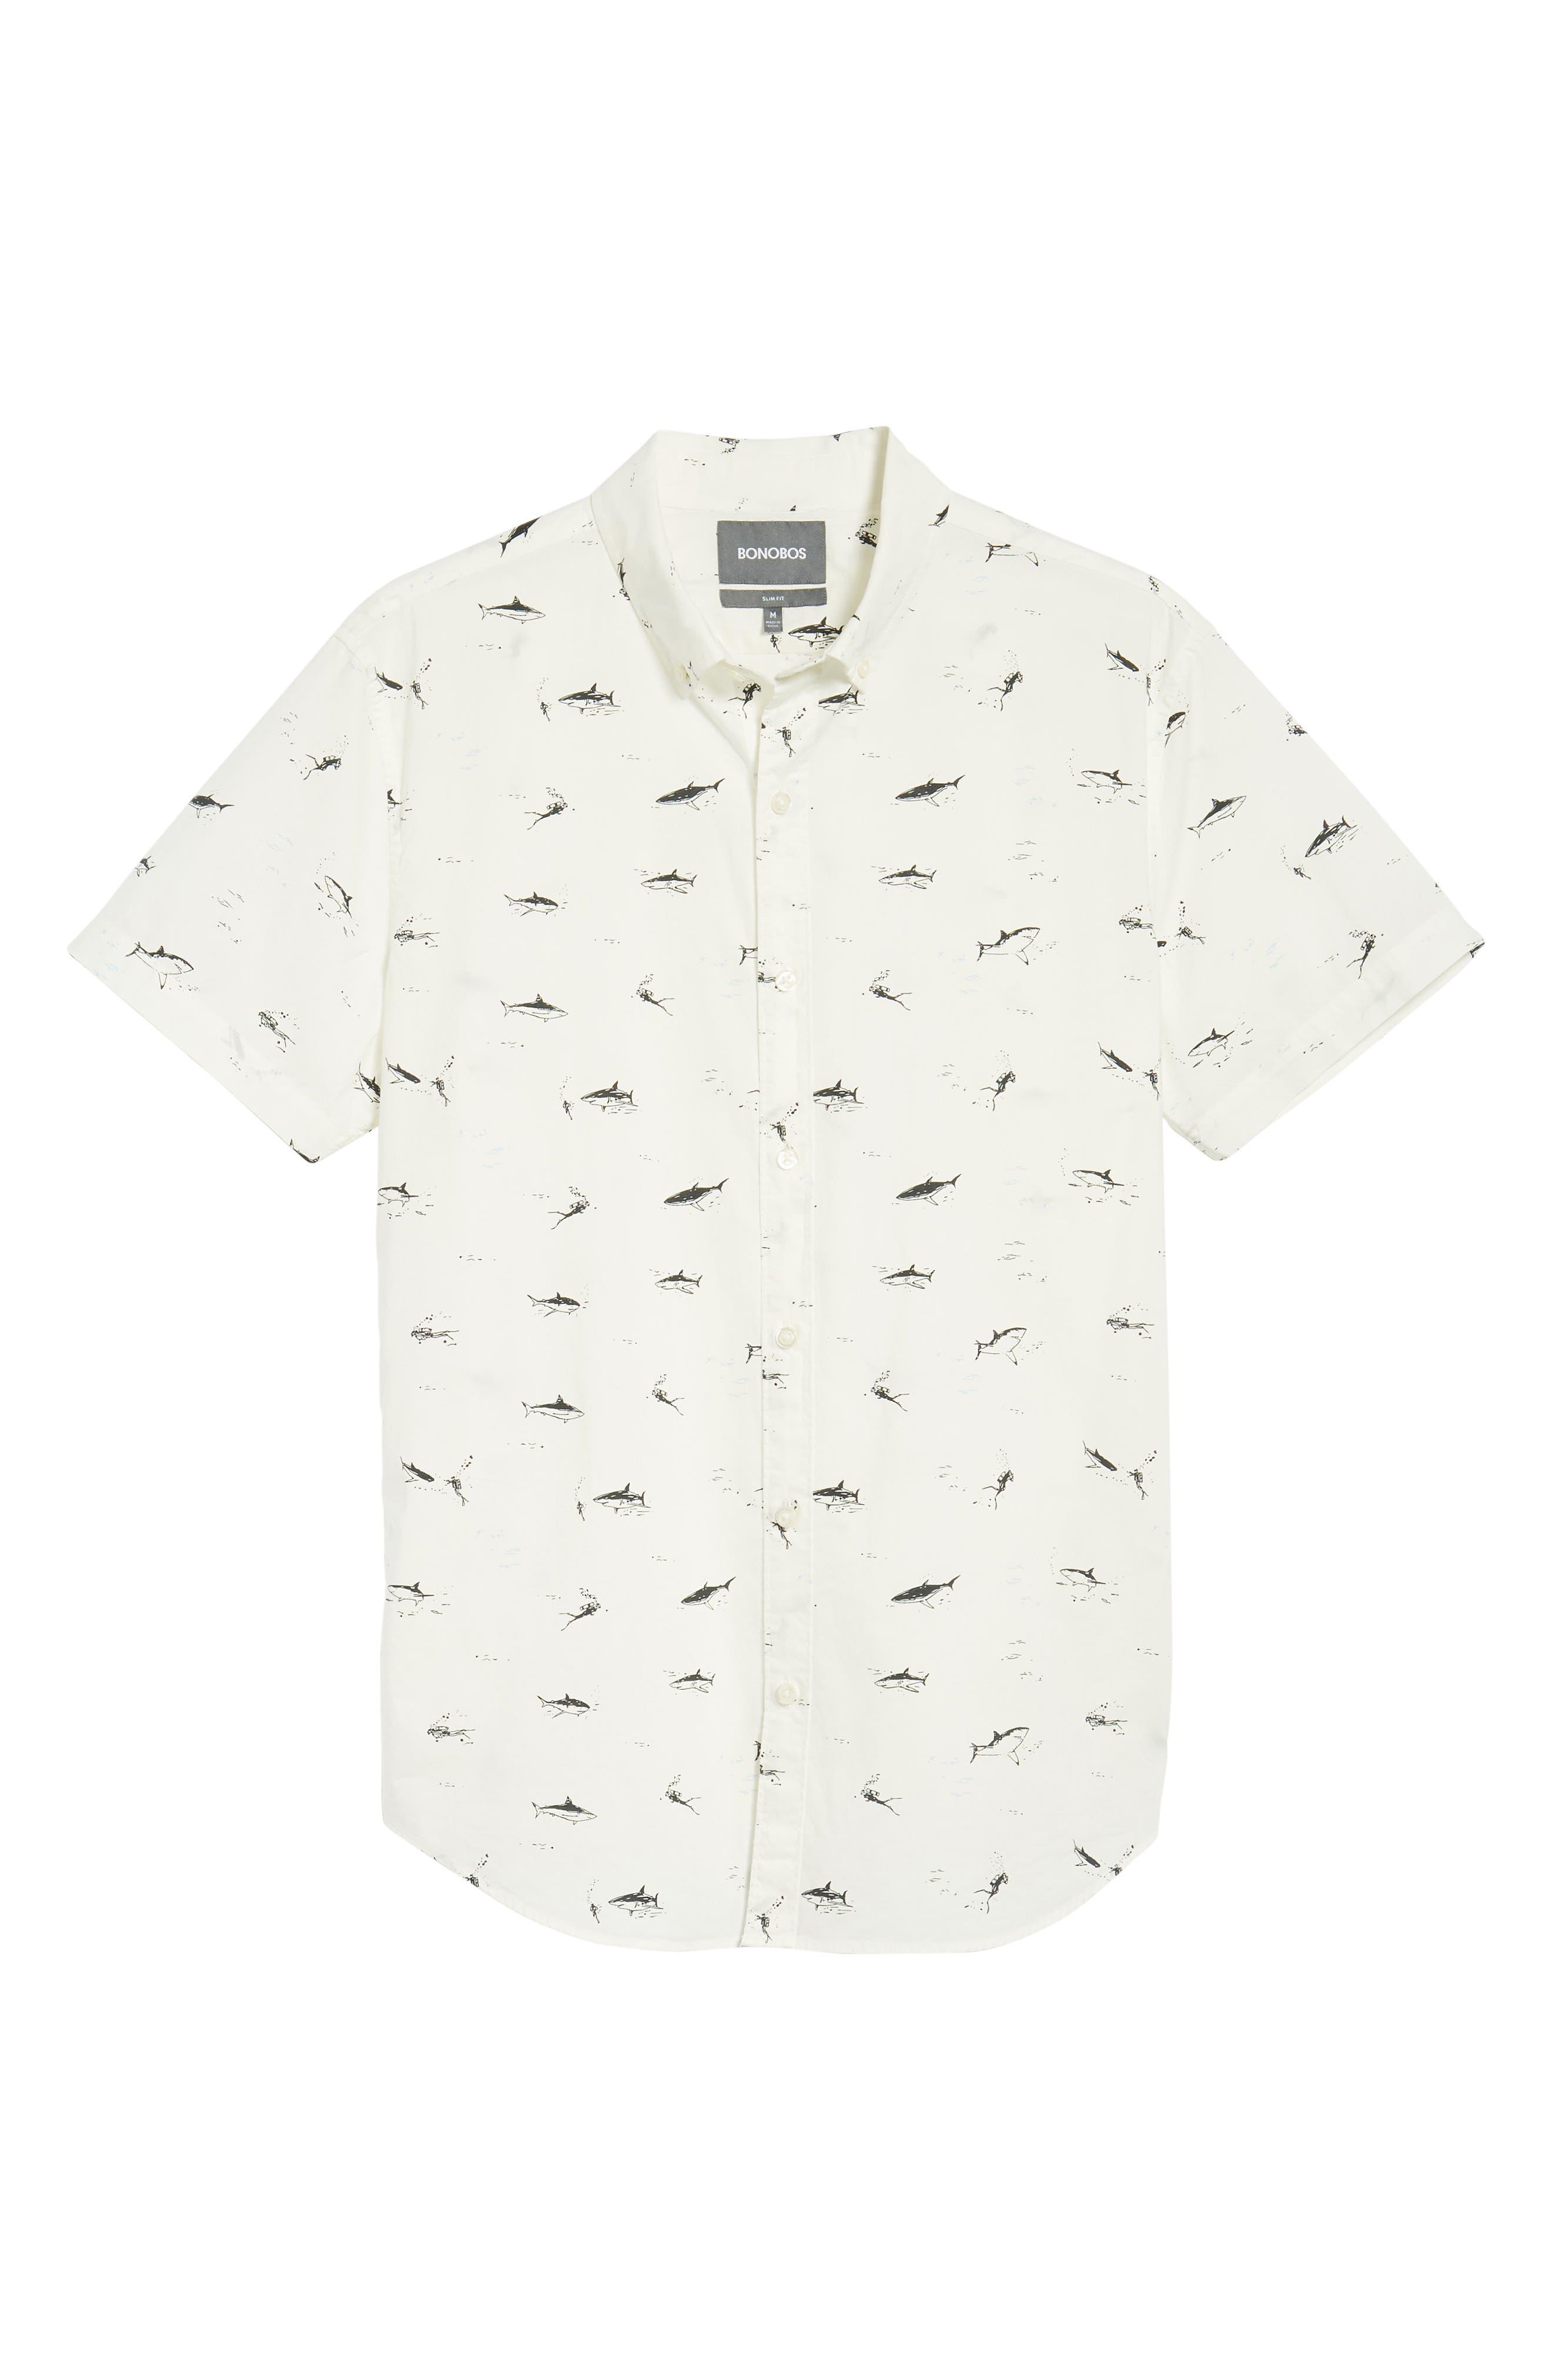 Riviera Slim Fit Shark Print Sport Shirt,                             Alternate thumbnail 6, color,                             Scuba Dive - Jet Black